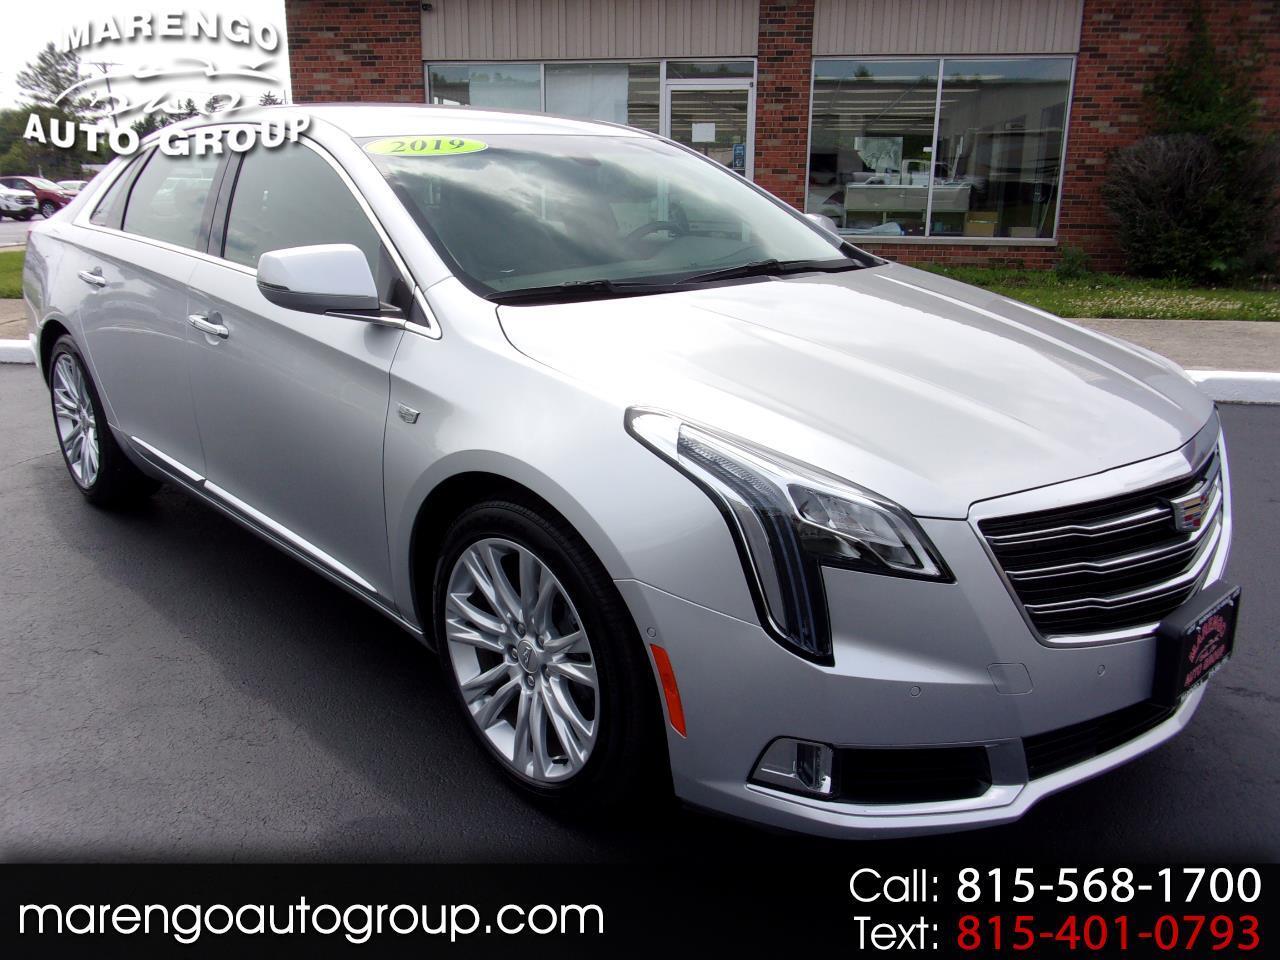 Cadillac XTS 4dr Sdn Luxury FWD 2019